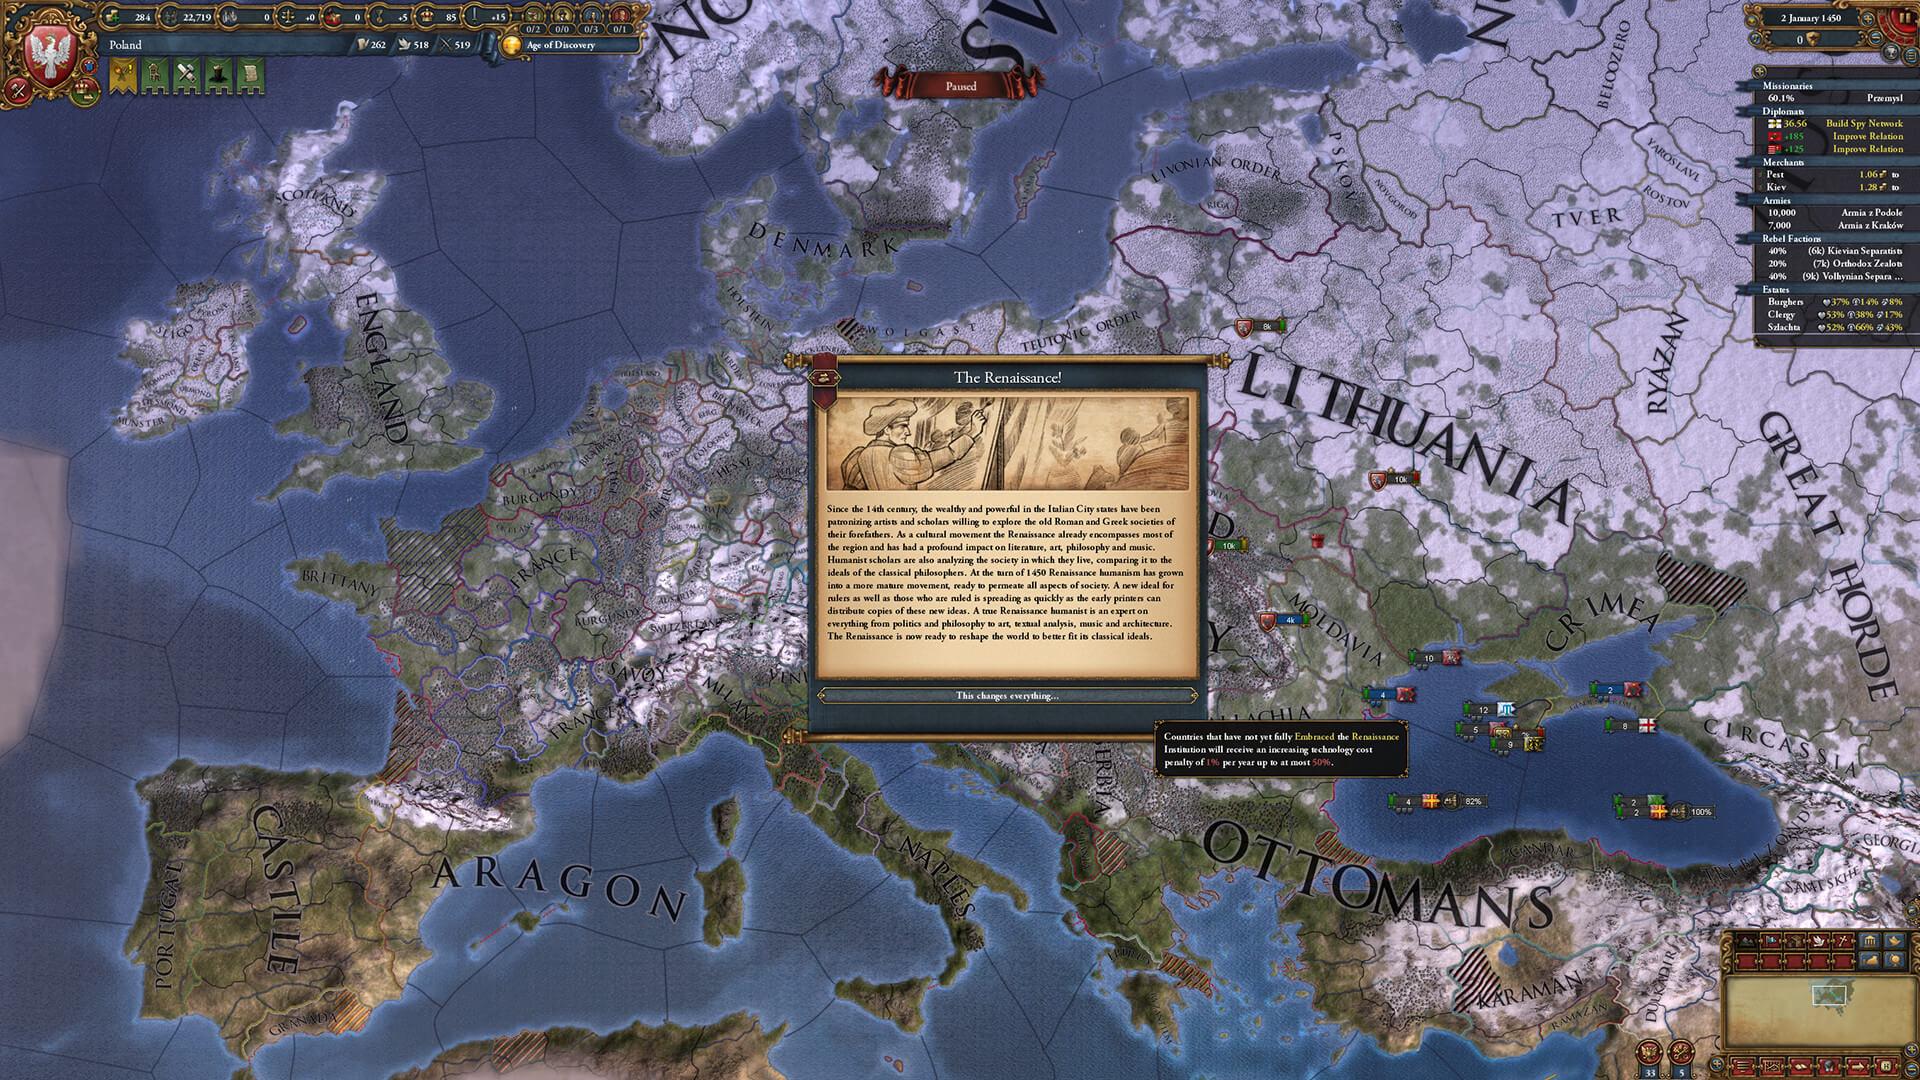 Europa universalis 4 strateji oyunu